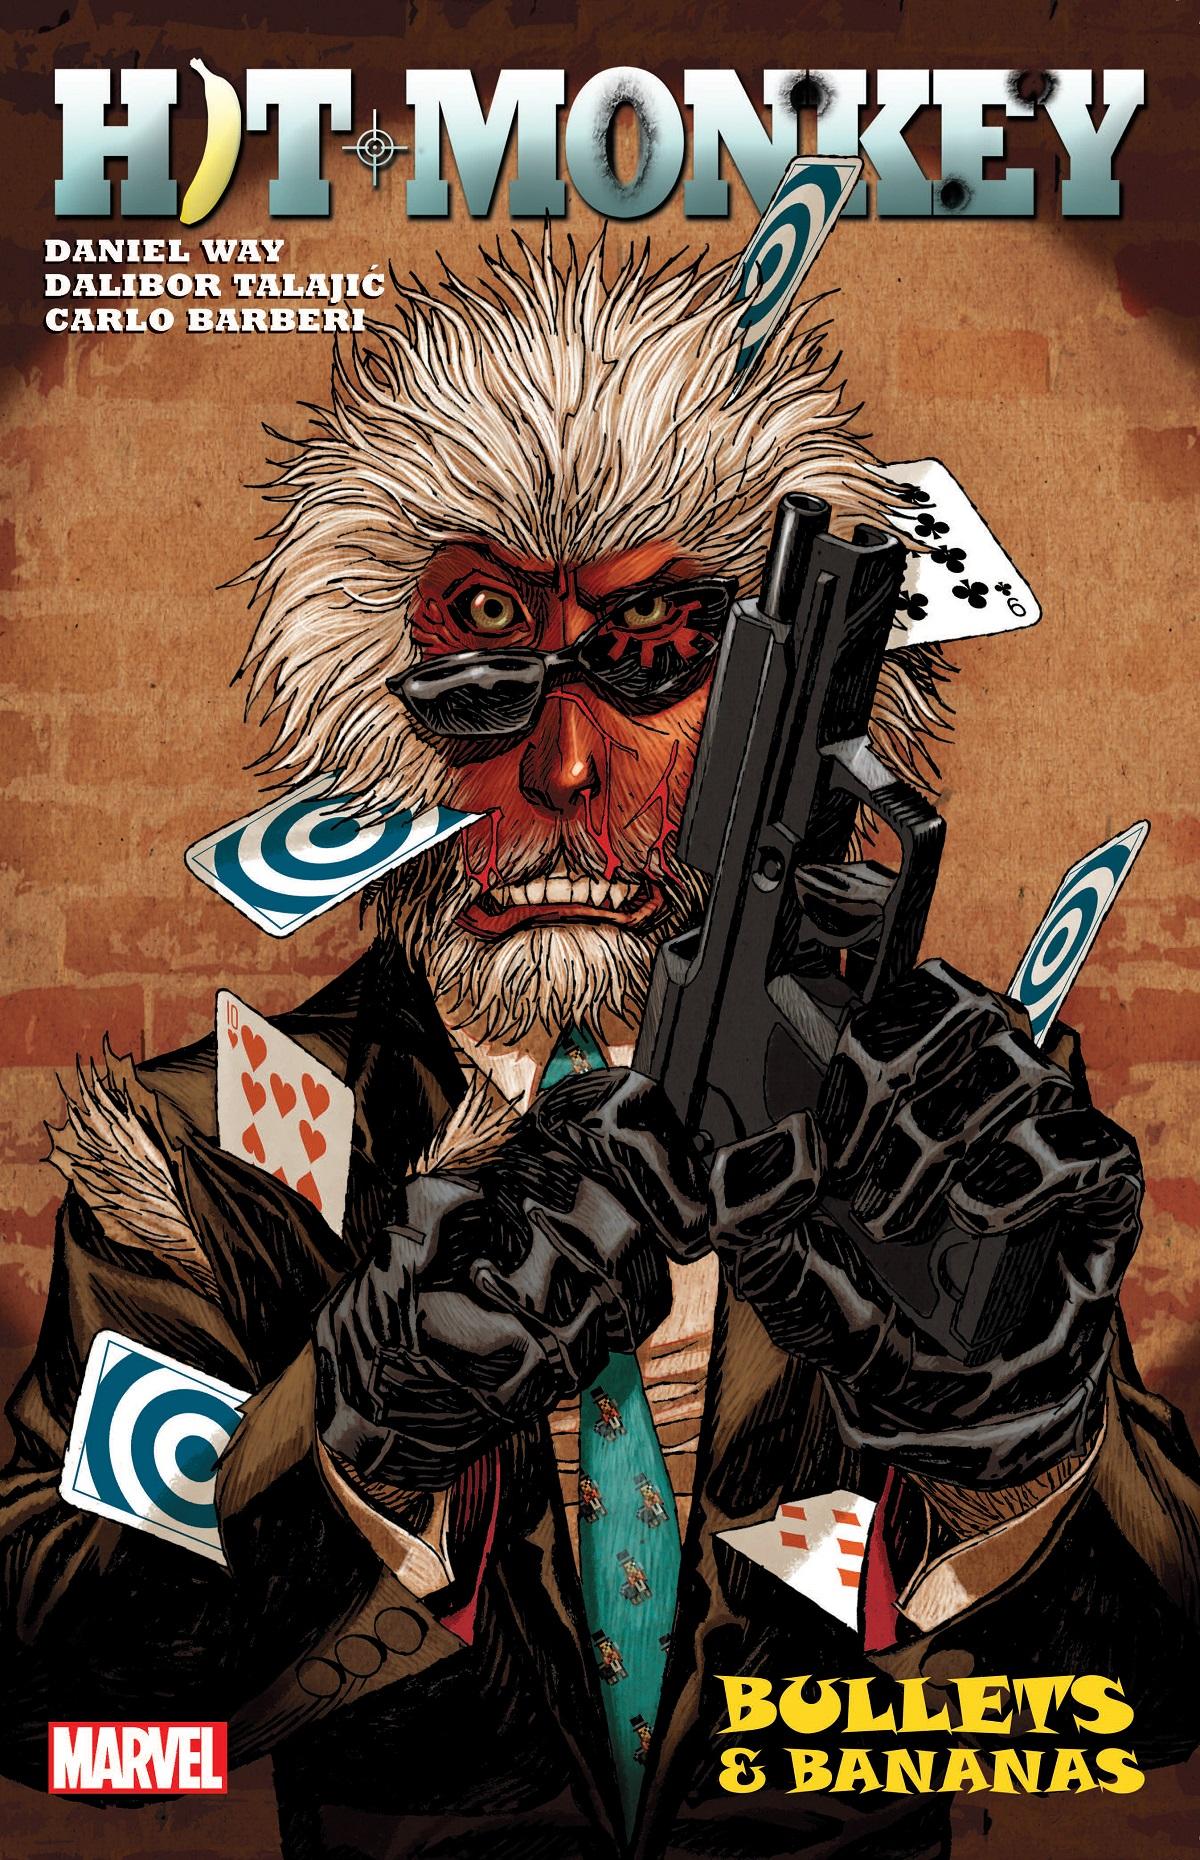 Hit-Monkey By Daniel Way: Bullets & Bananas (Trade Paperback)